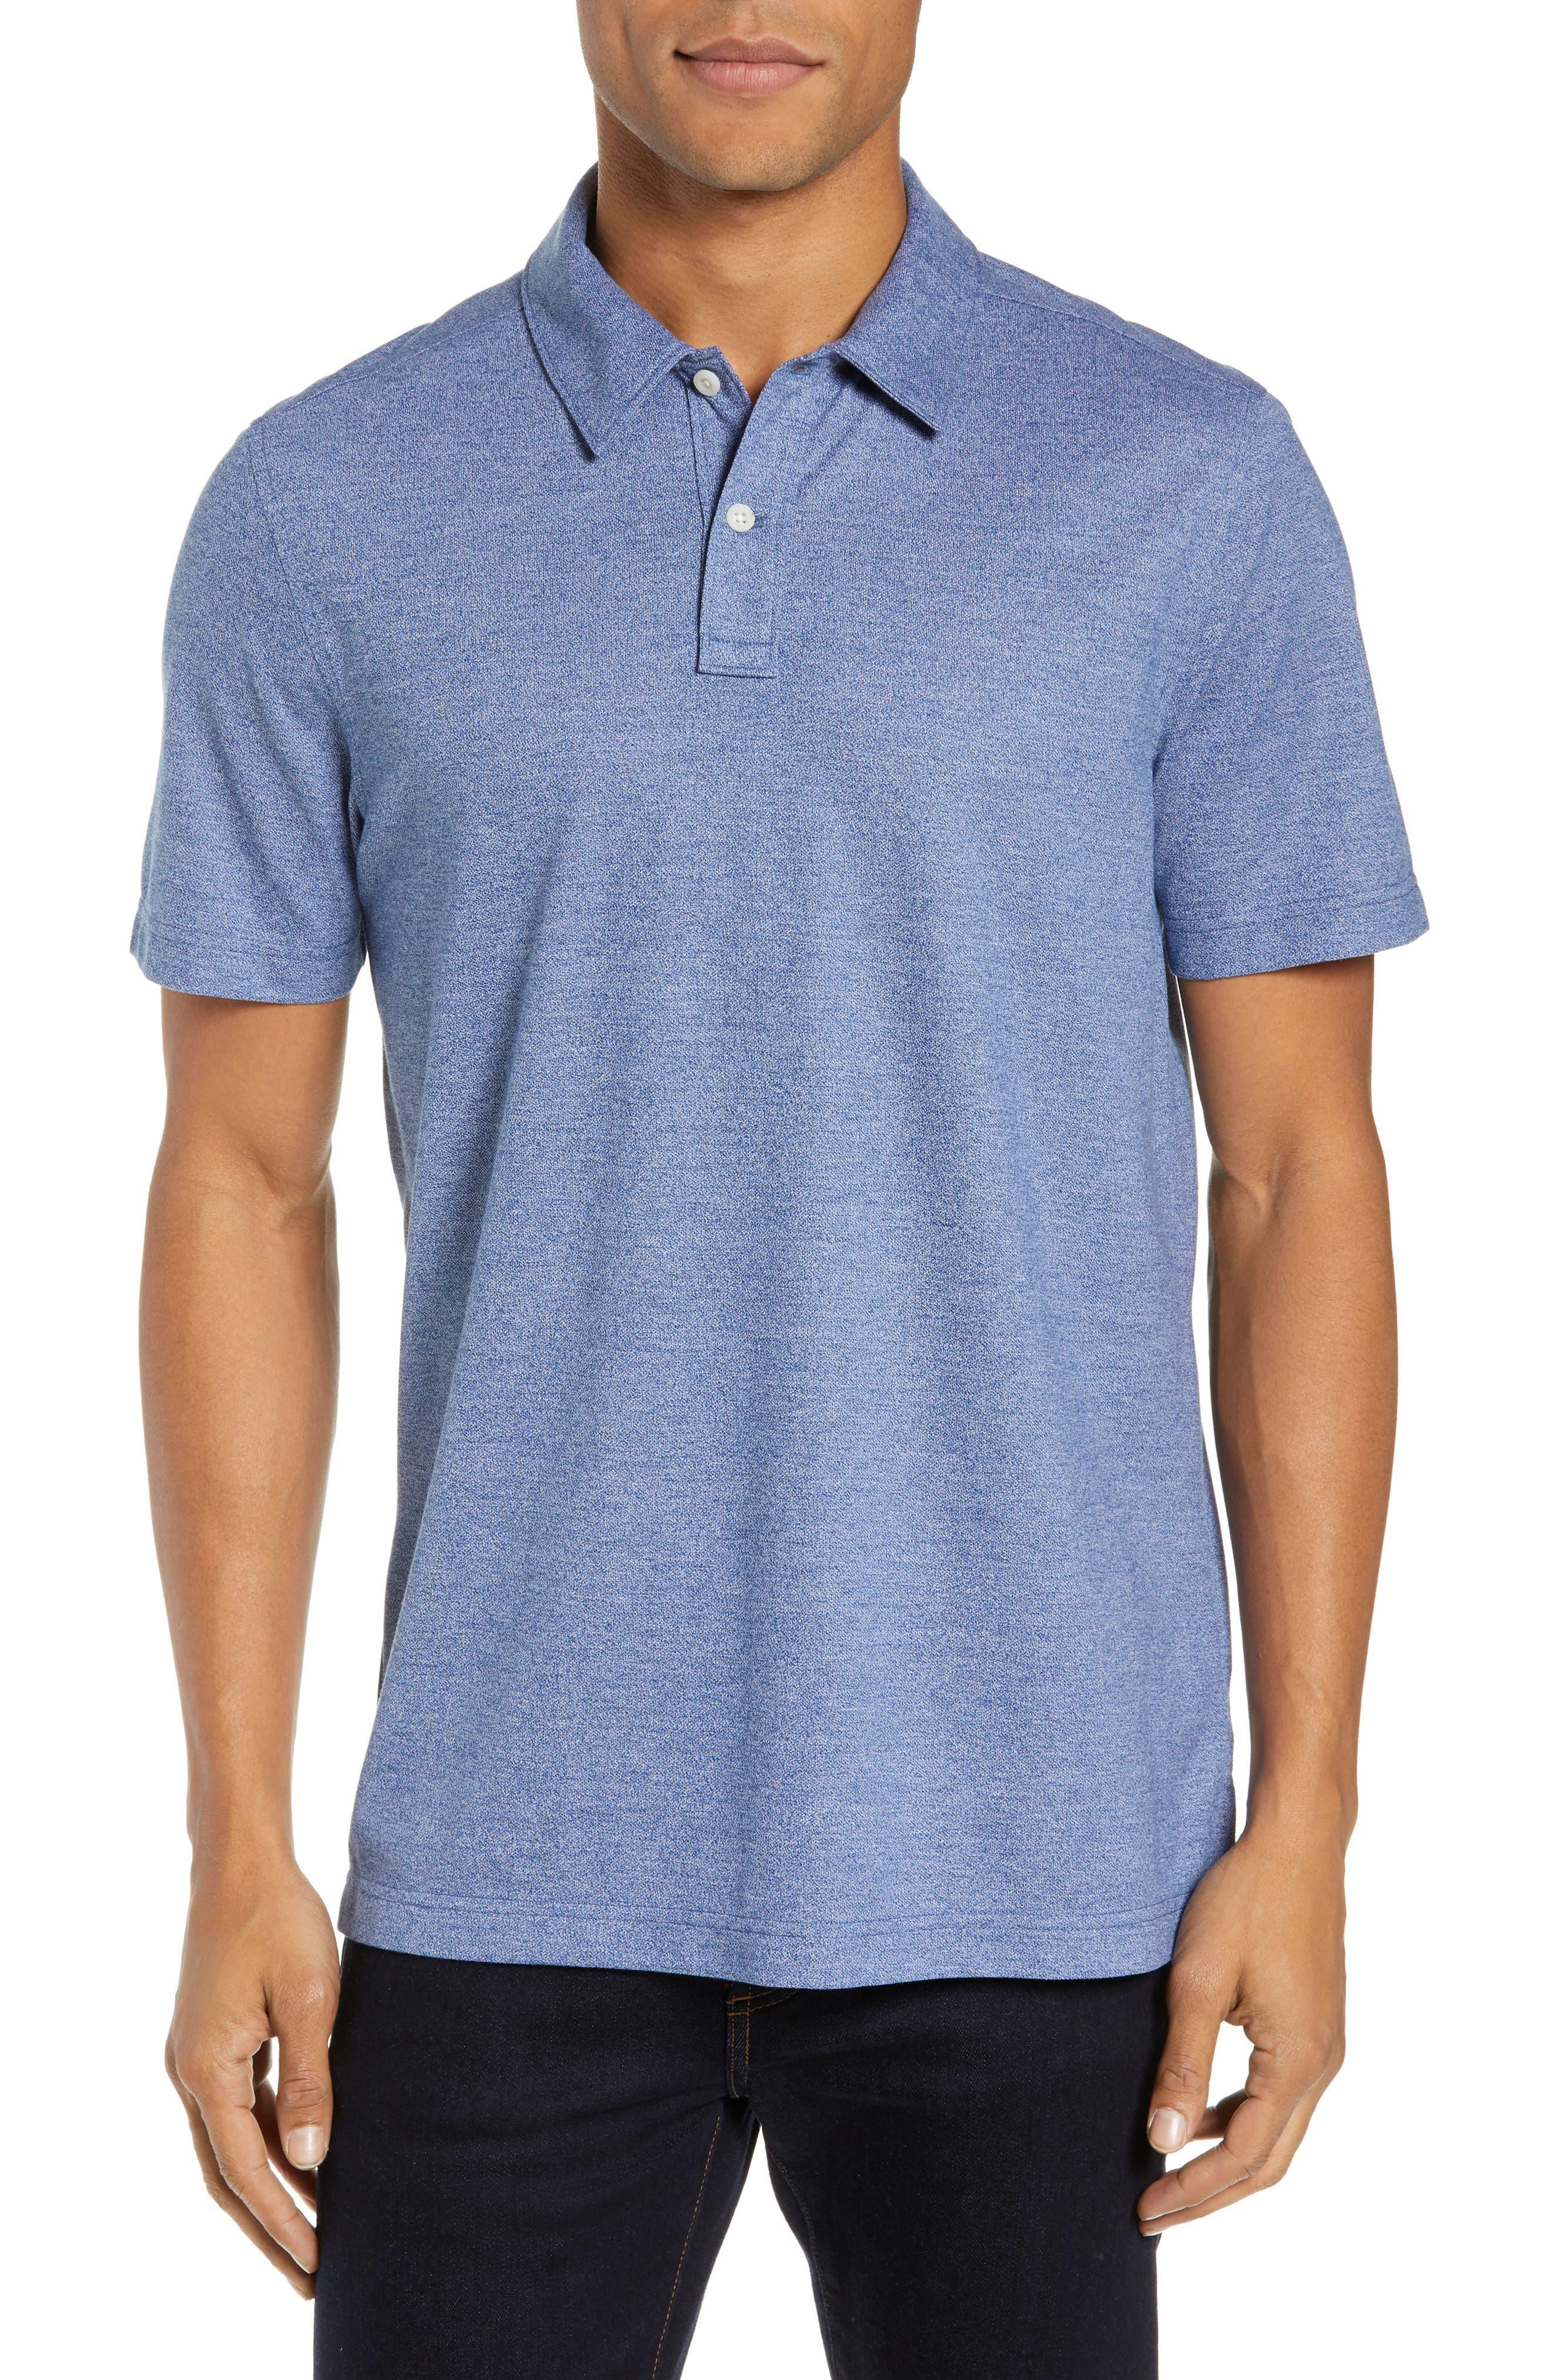 NORDSTROM MEN'S SHOP, Regular Fit Polo, Main thumbnail 1, color, BLUE CASPIA MELANGE